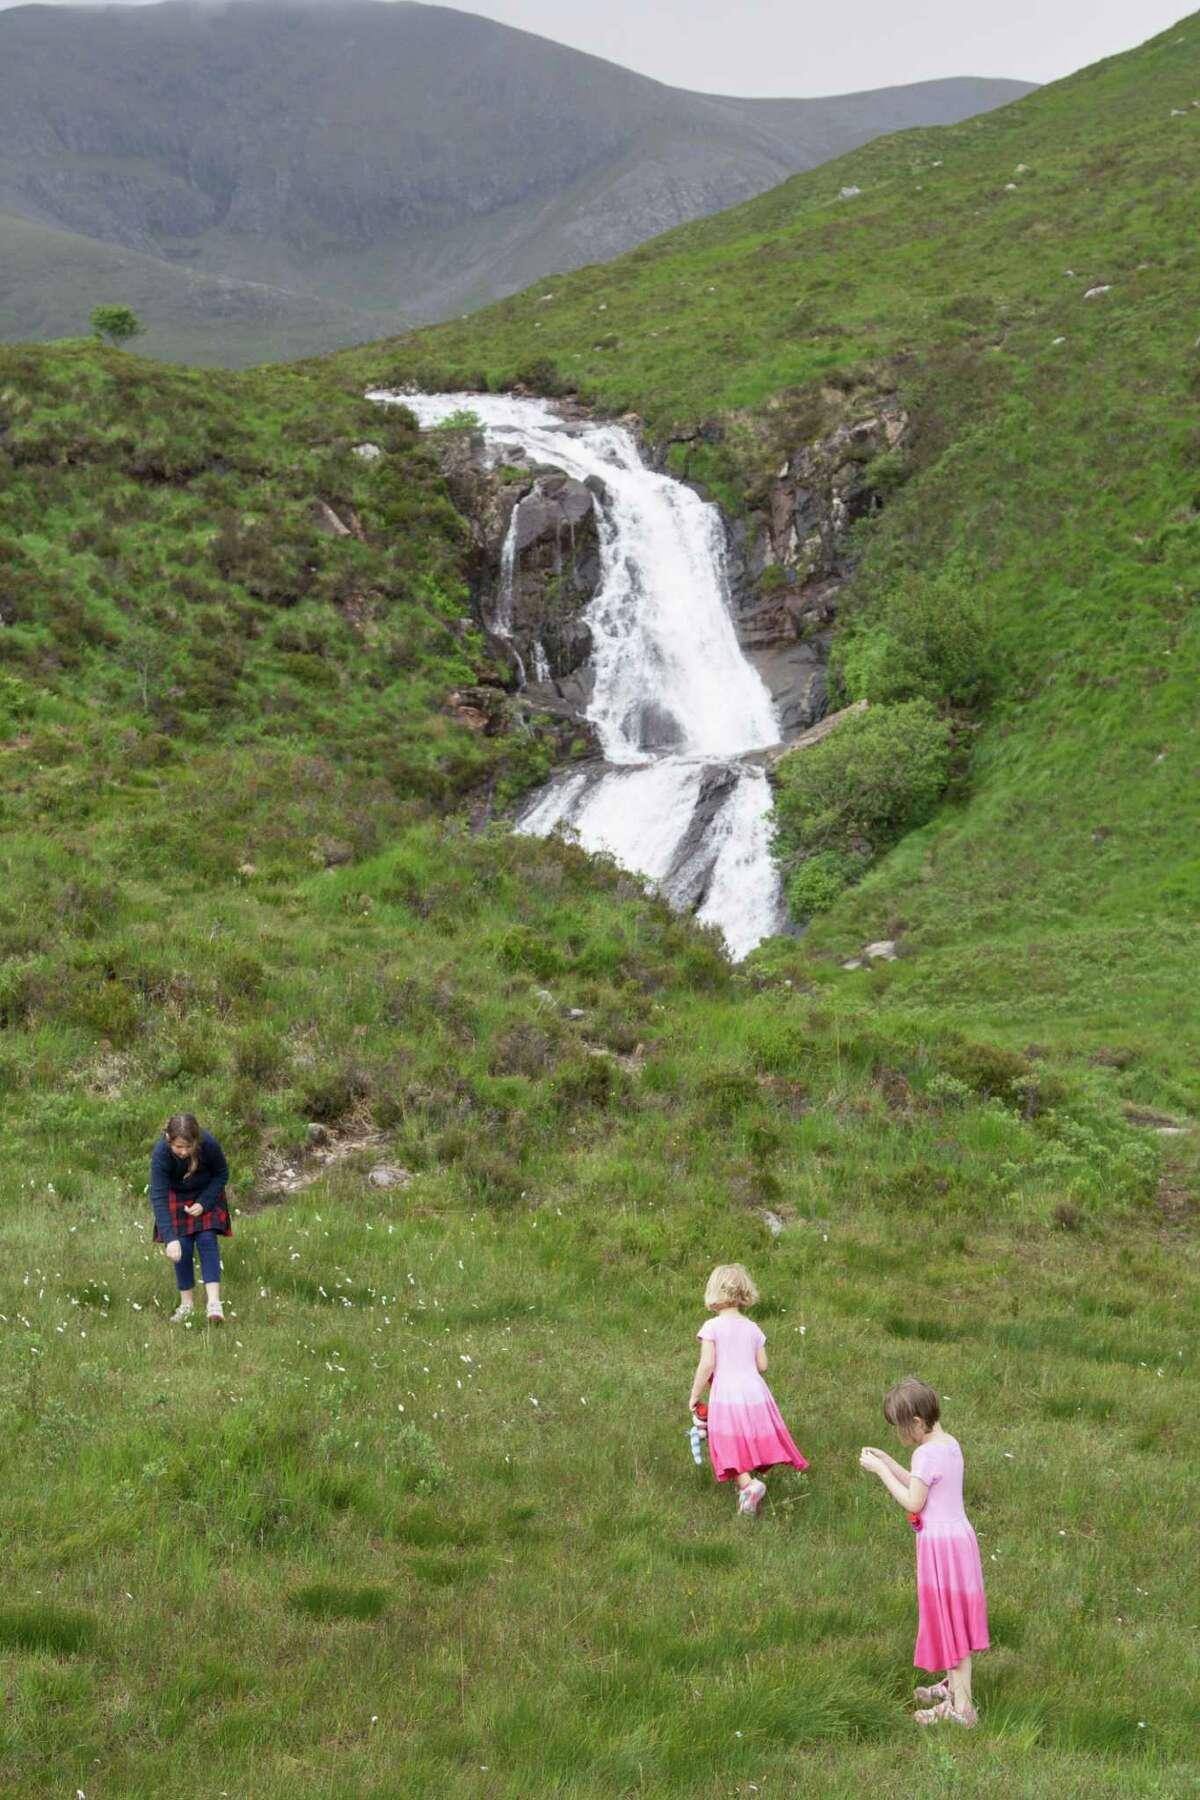 Right: Children enjoy a roadside waterfall on the Isle of Skye.